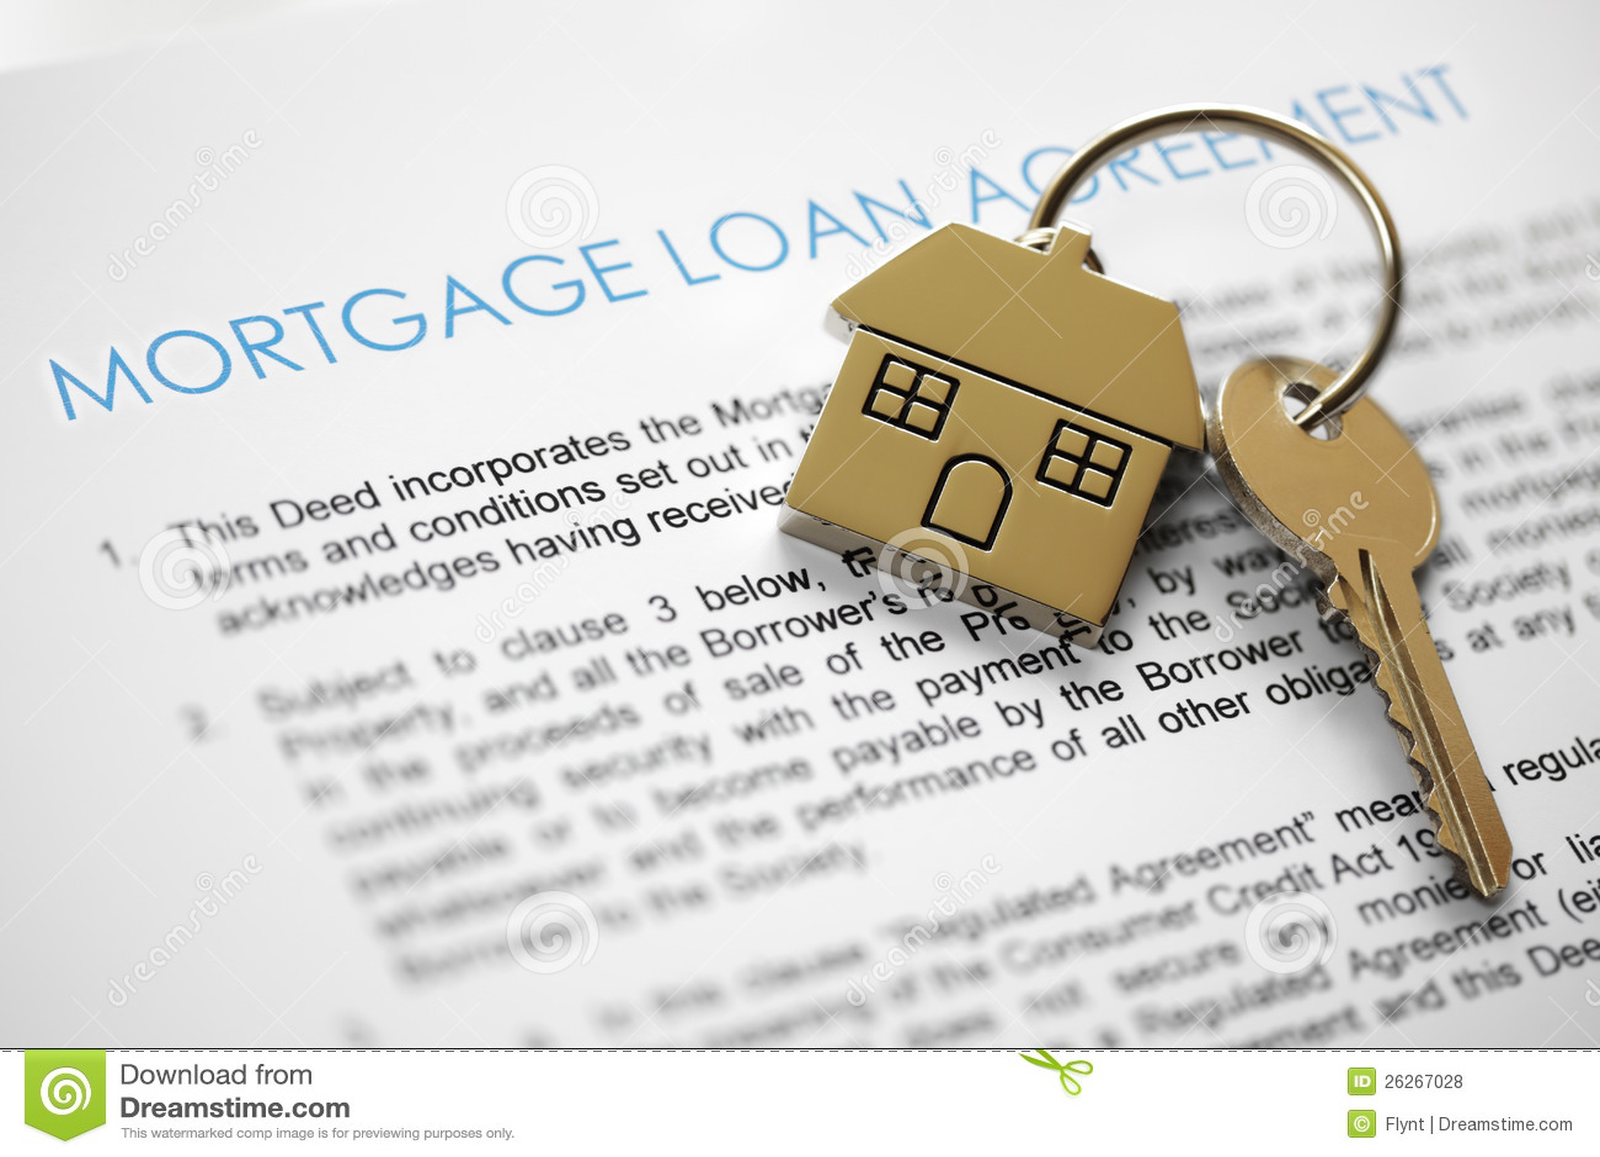 Mortgage Application Royalty Free Stock Photos - Image: 26267028